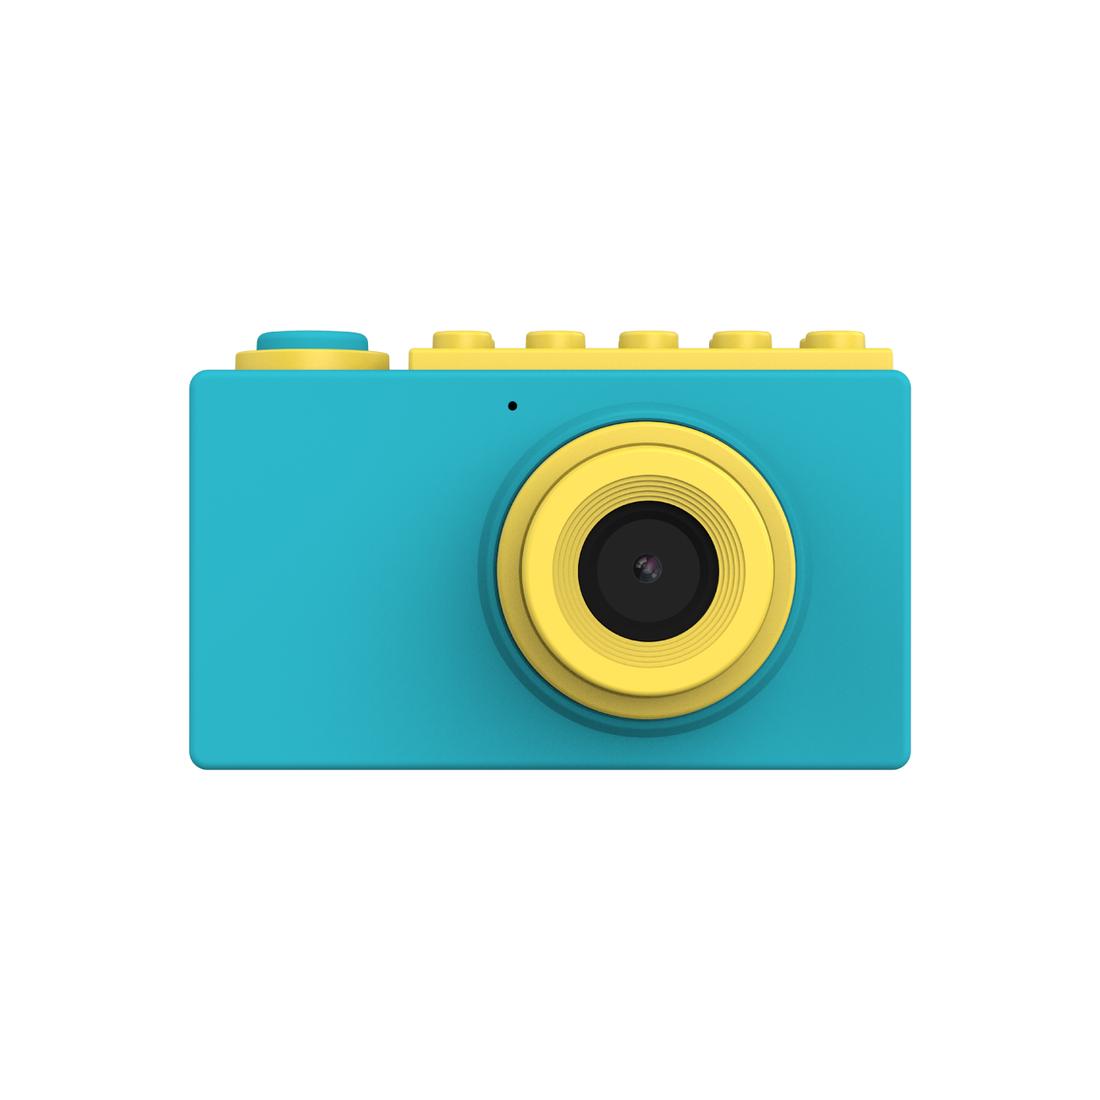 camera2-blue-1_1100x